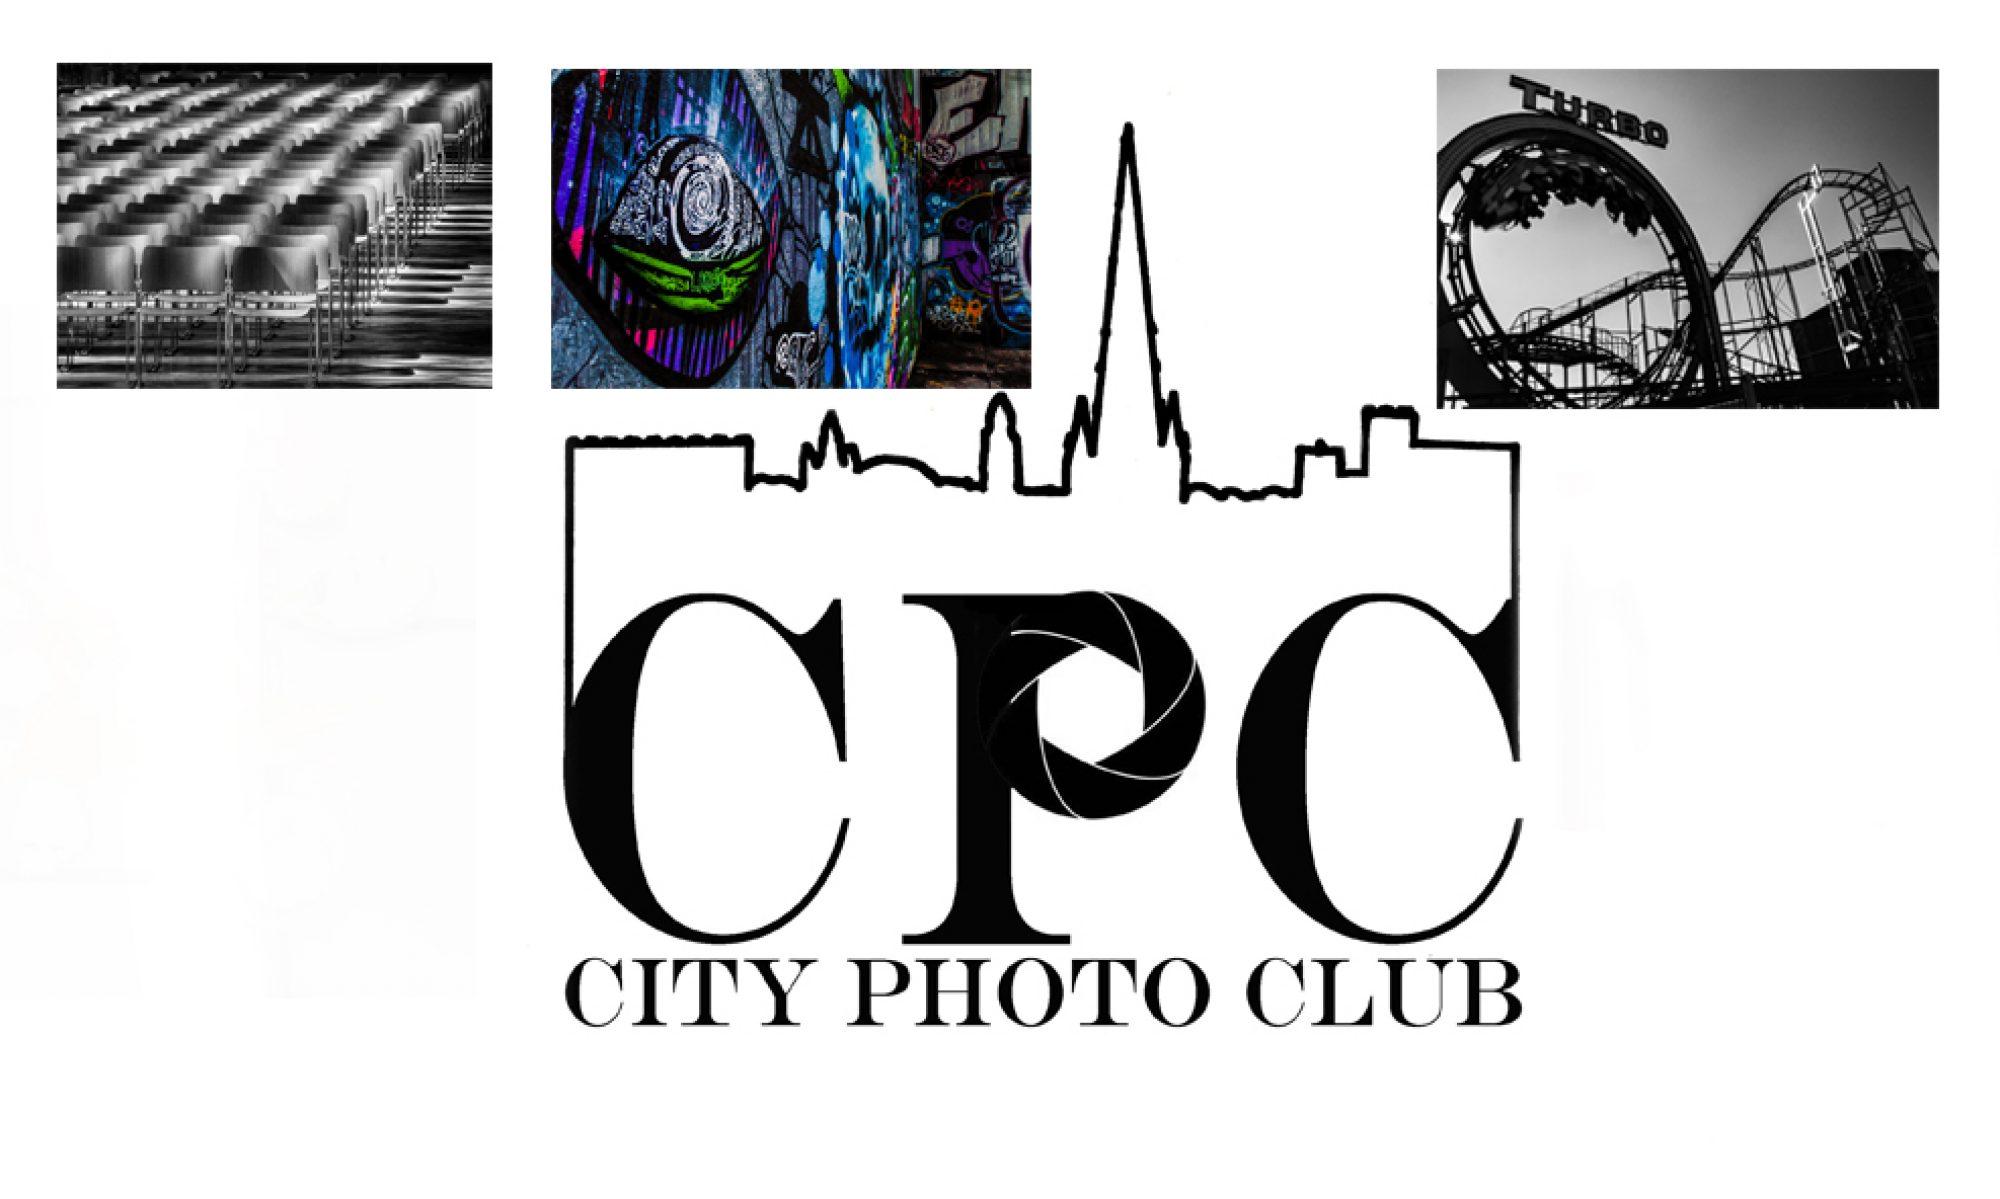 City Photo Club